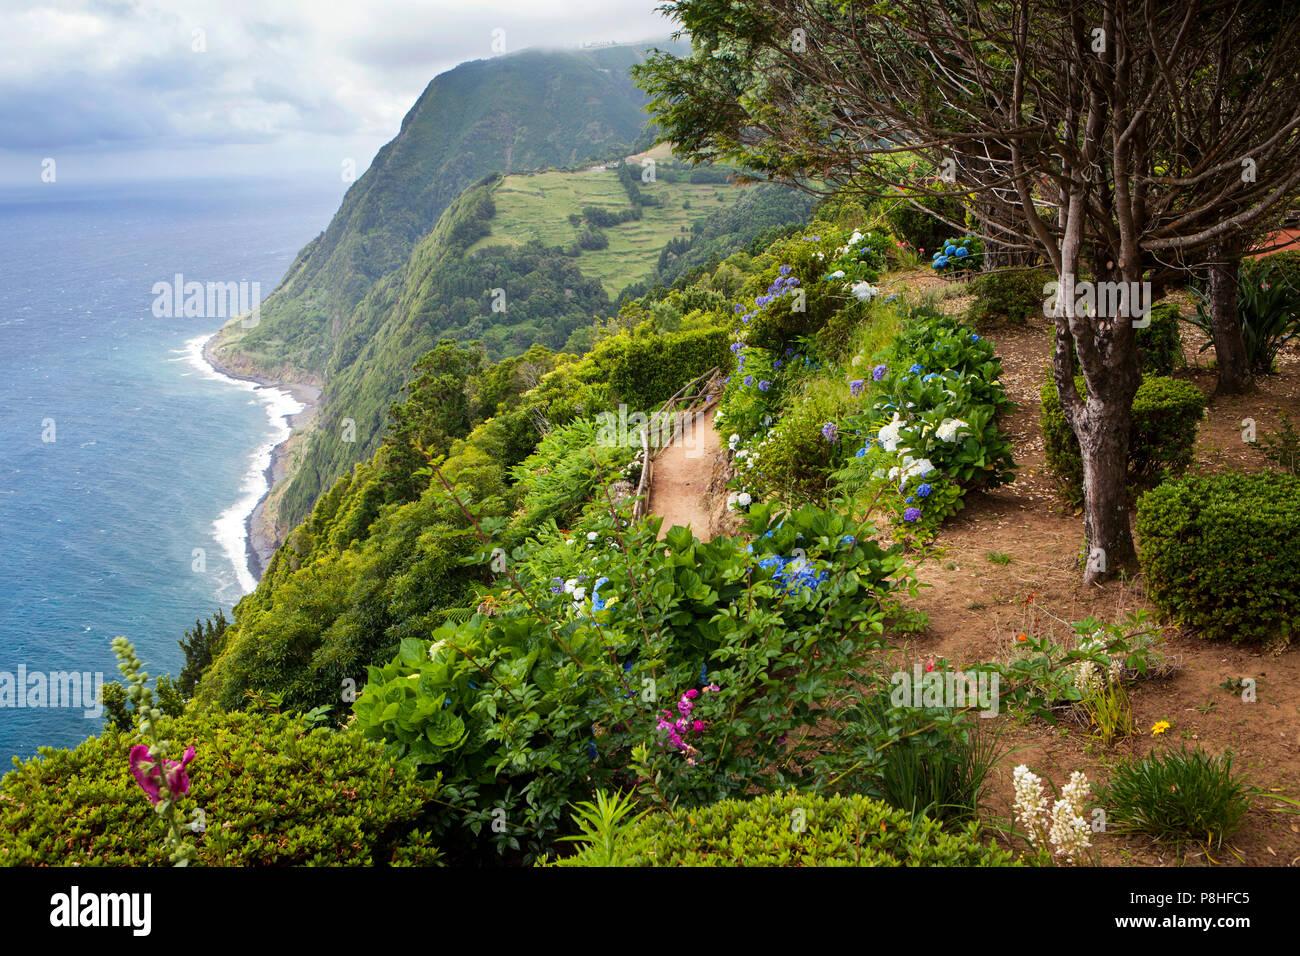 Mirador de Ponta do Sossego, Isla de Sao Miguel, Azores, Portugal Foto de stock